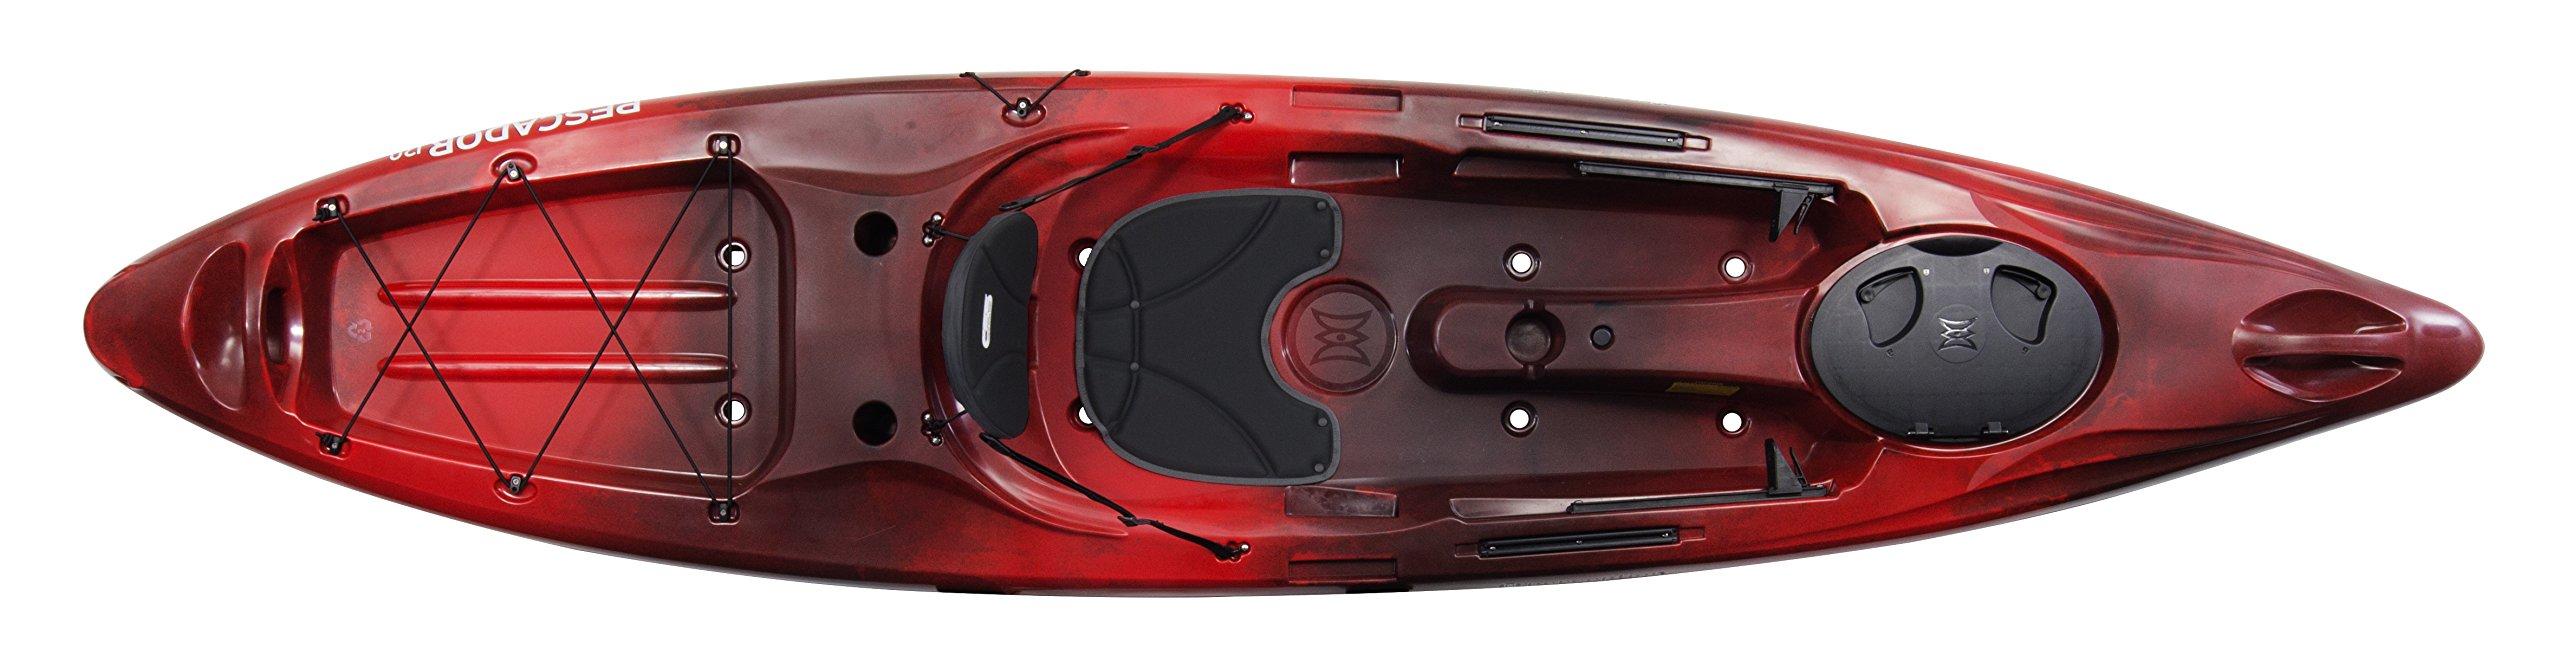 Perception Kayak Pescador 12 Bs, Red Tiger